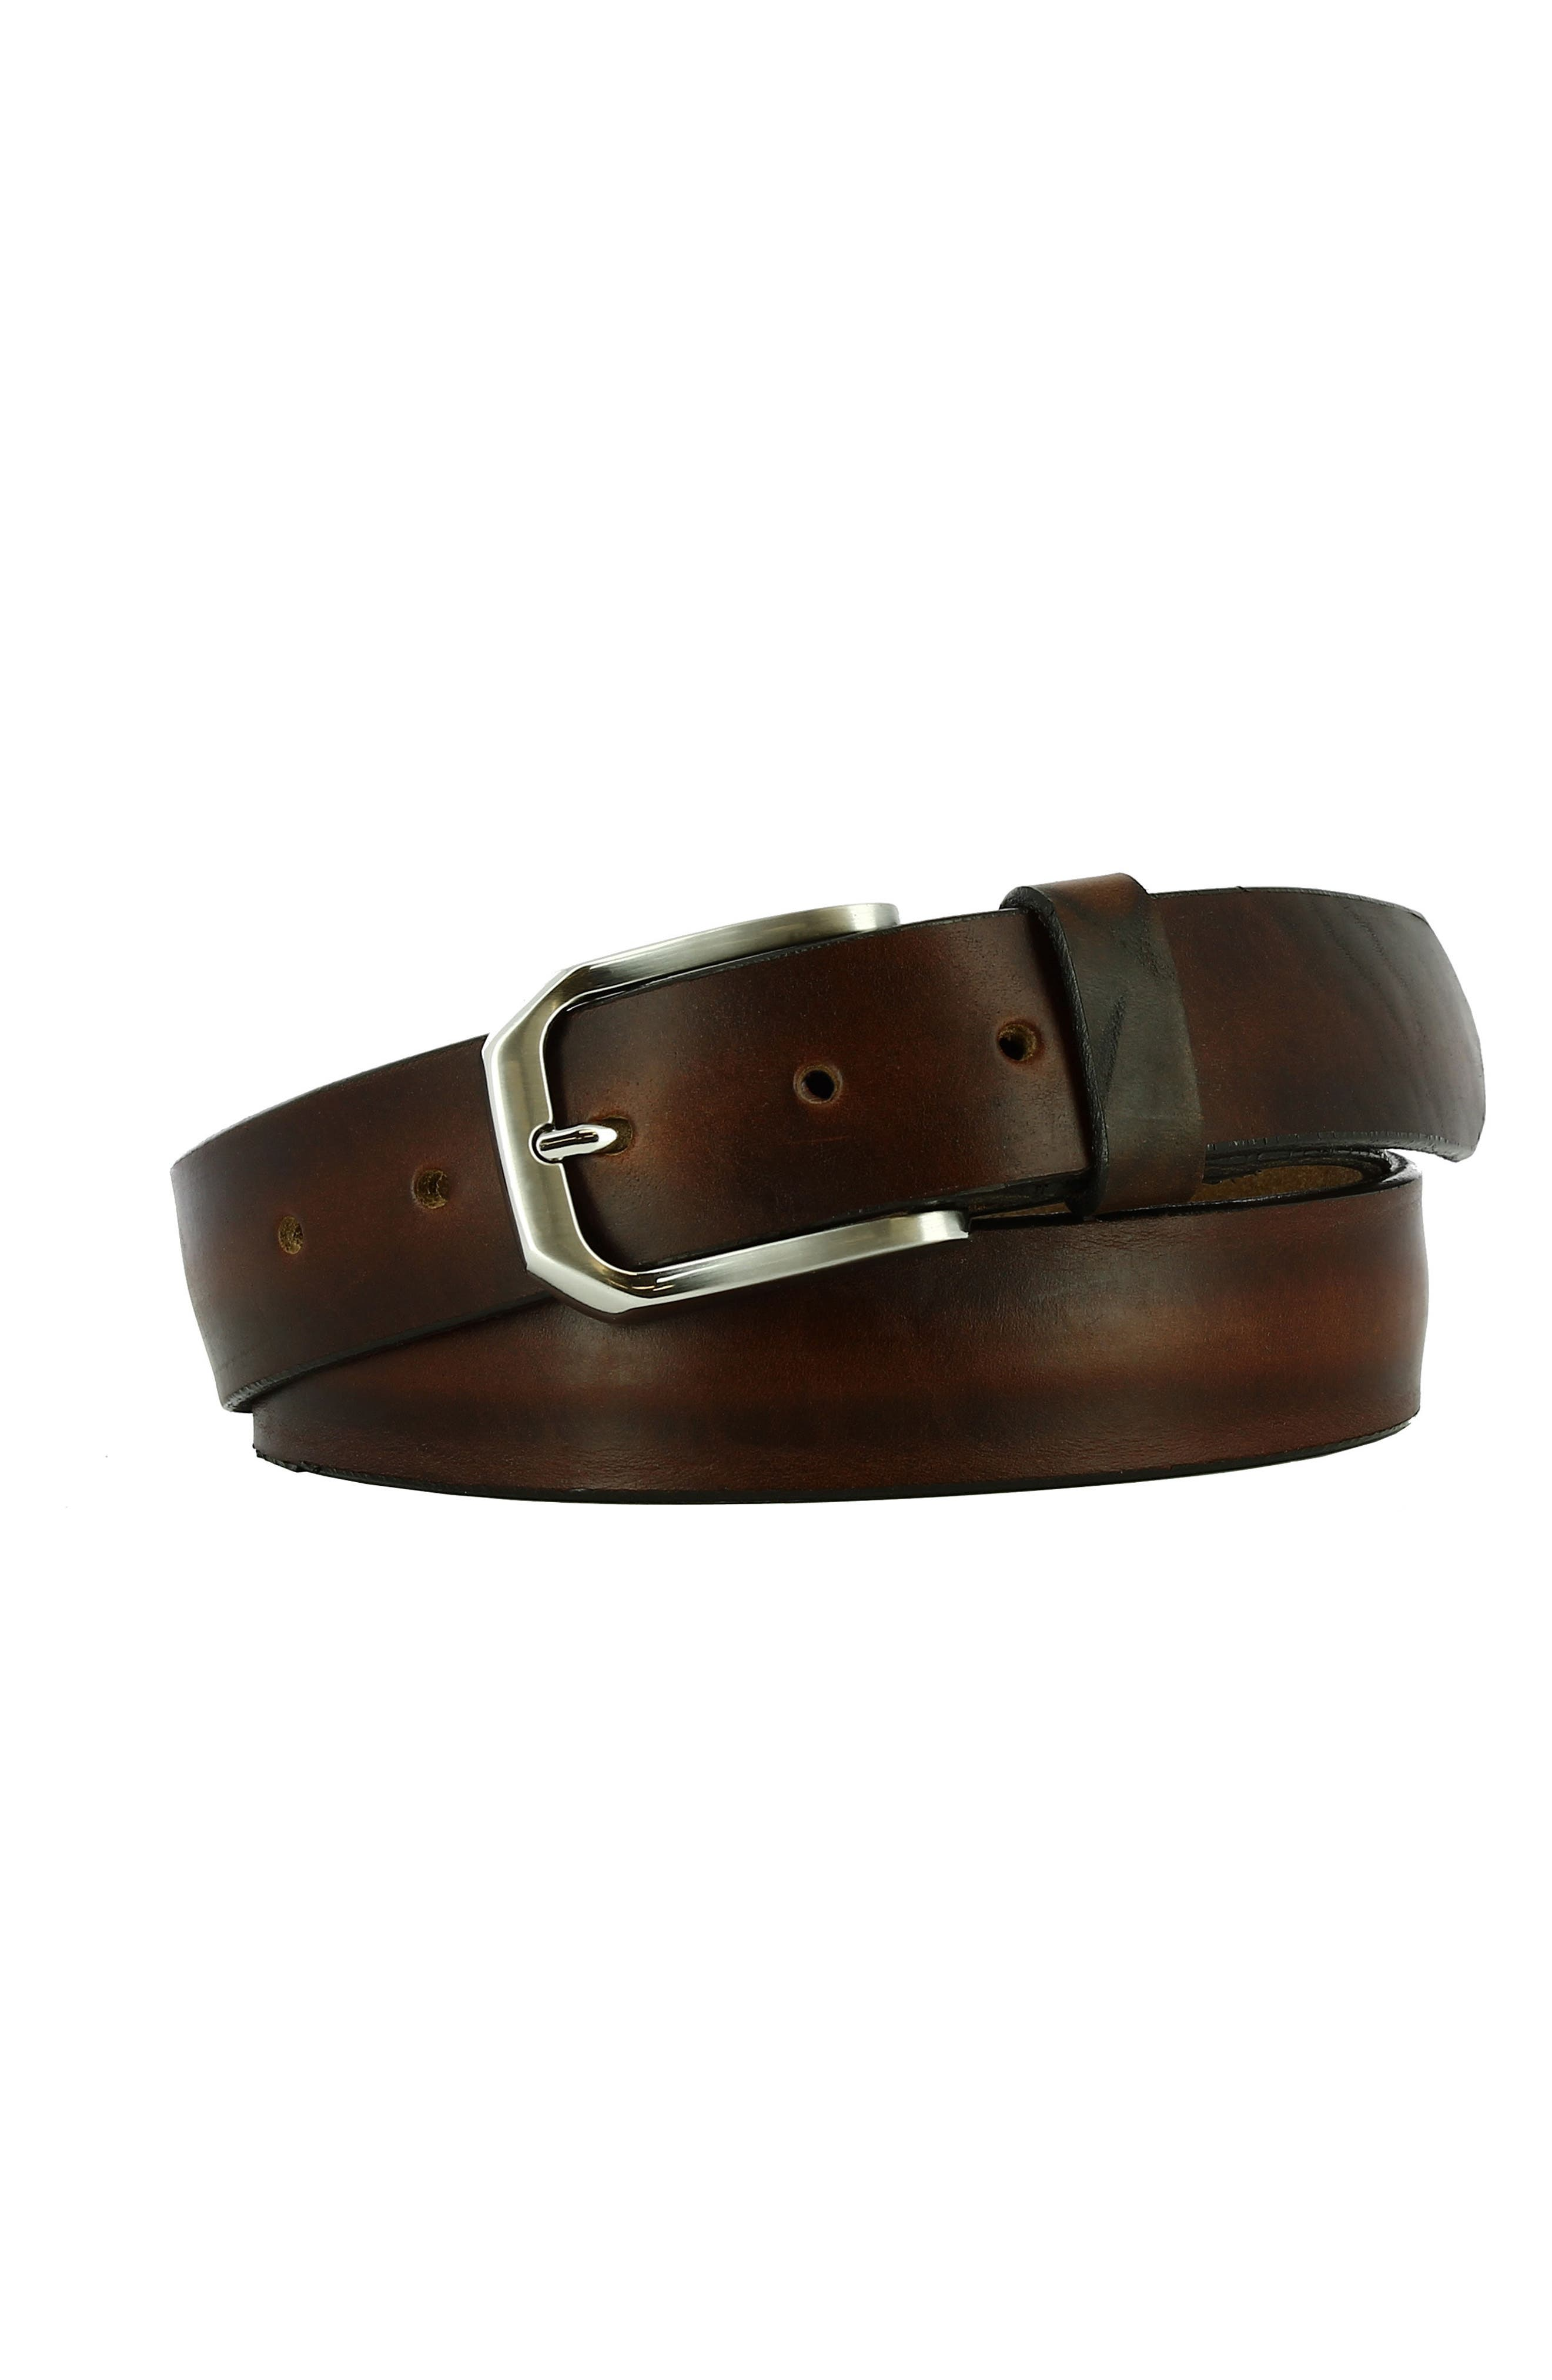 Main Image - Remo Tulliani Gunner Leather Belt